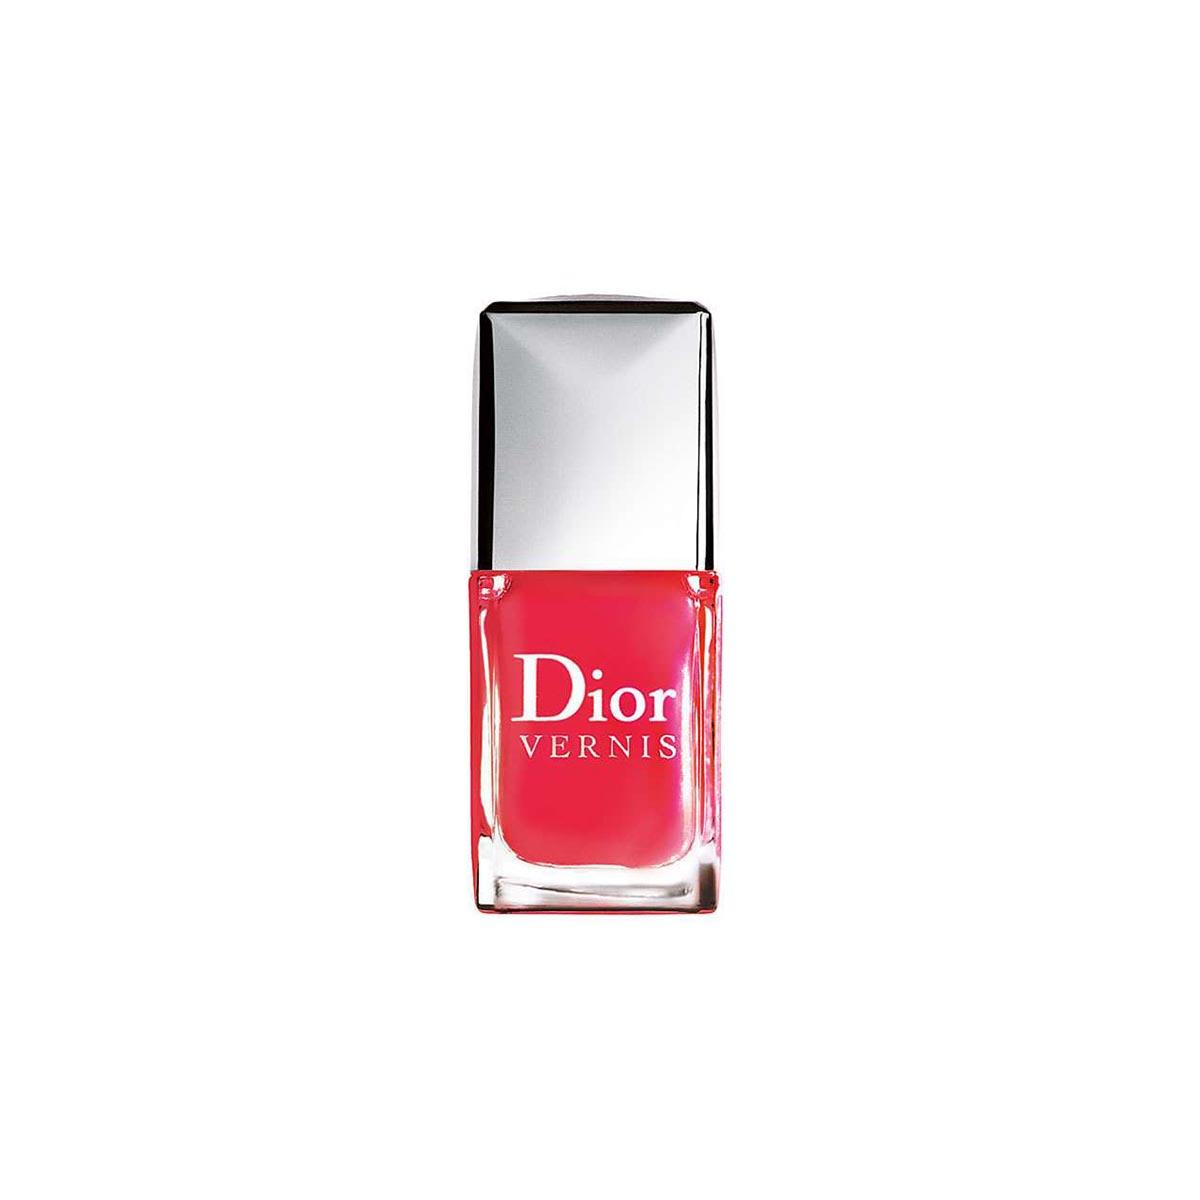 Dior rouge dior vernis 785 cosmopolite